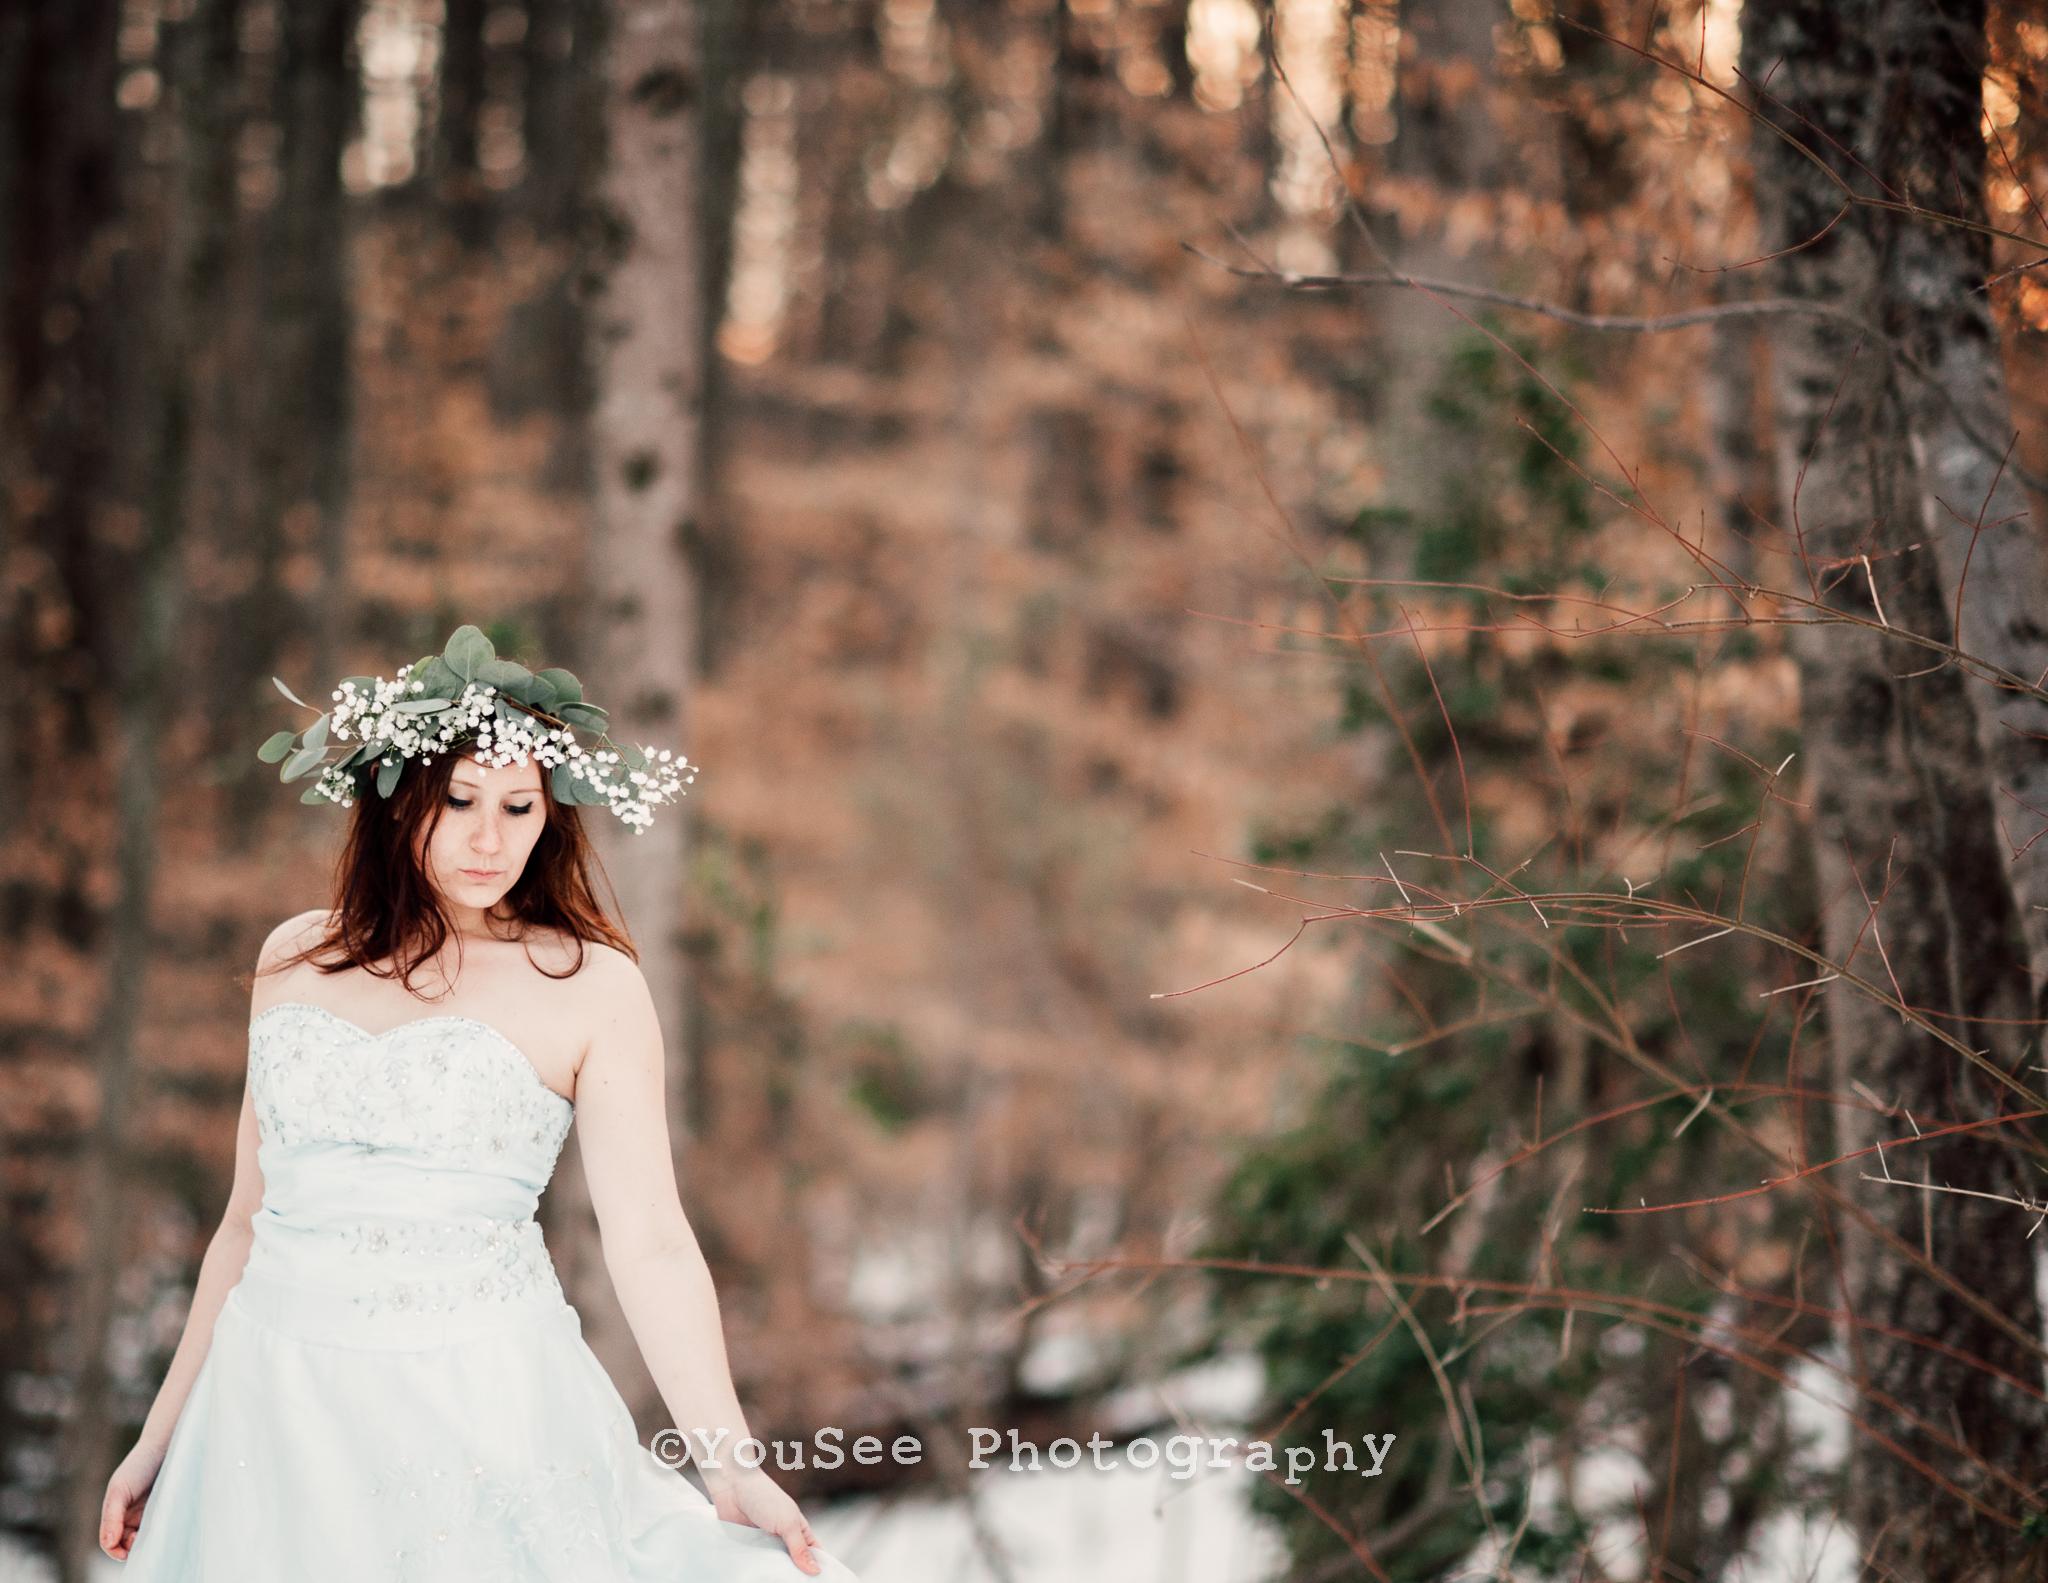 seniorportrait_fredericksburg_photography_winter2 (31)